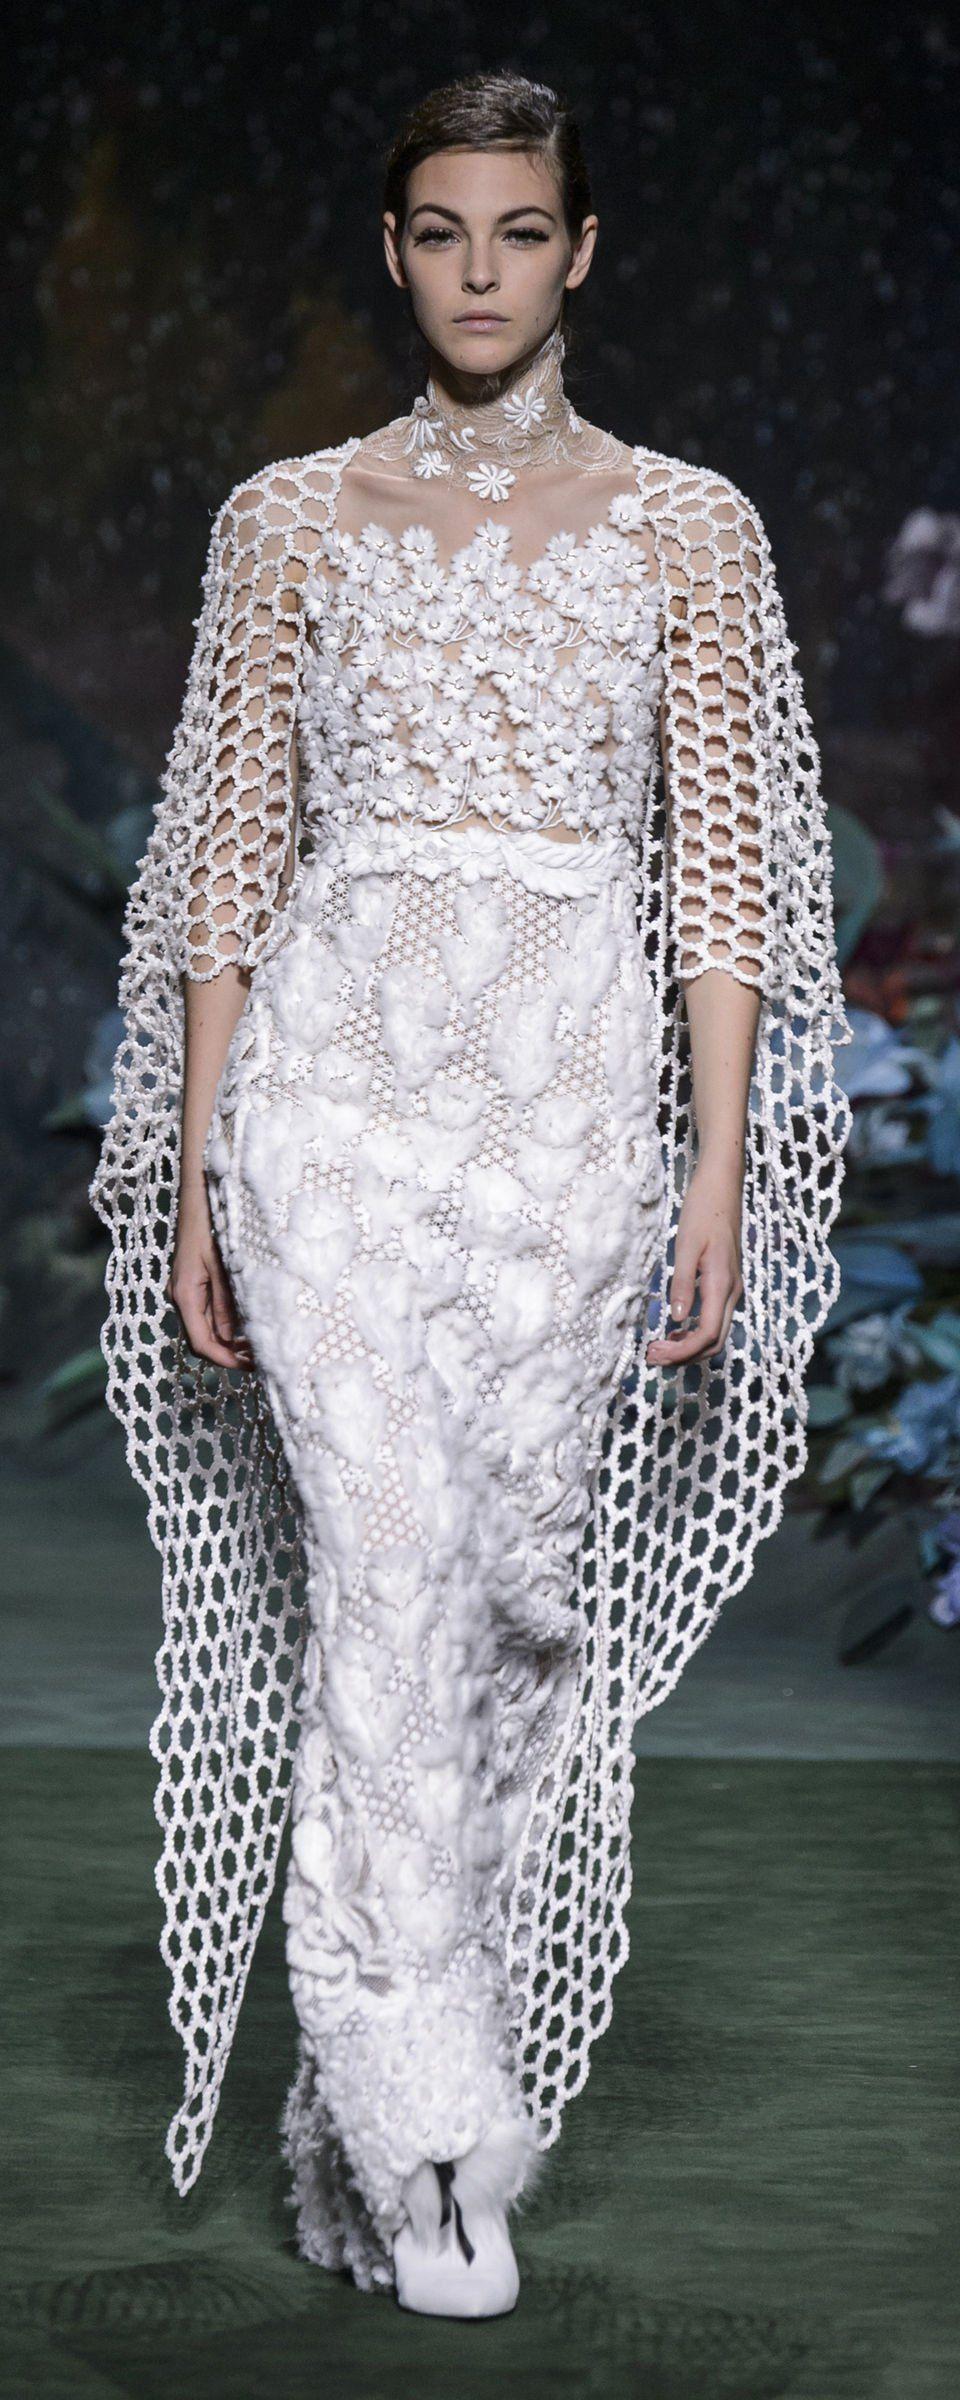 Fendi fallwinter couture beautiful gowns black white